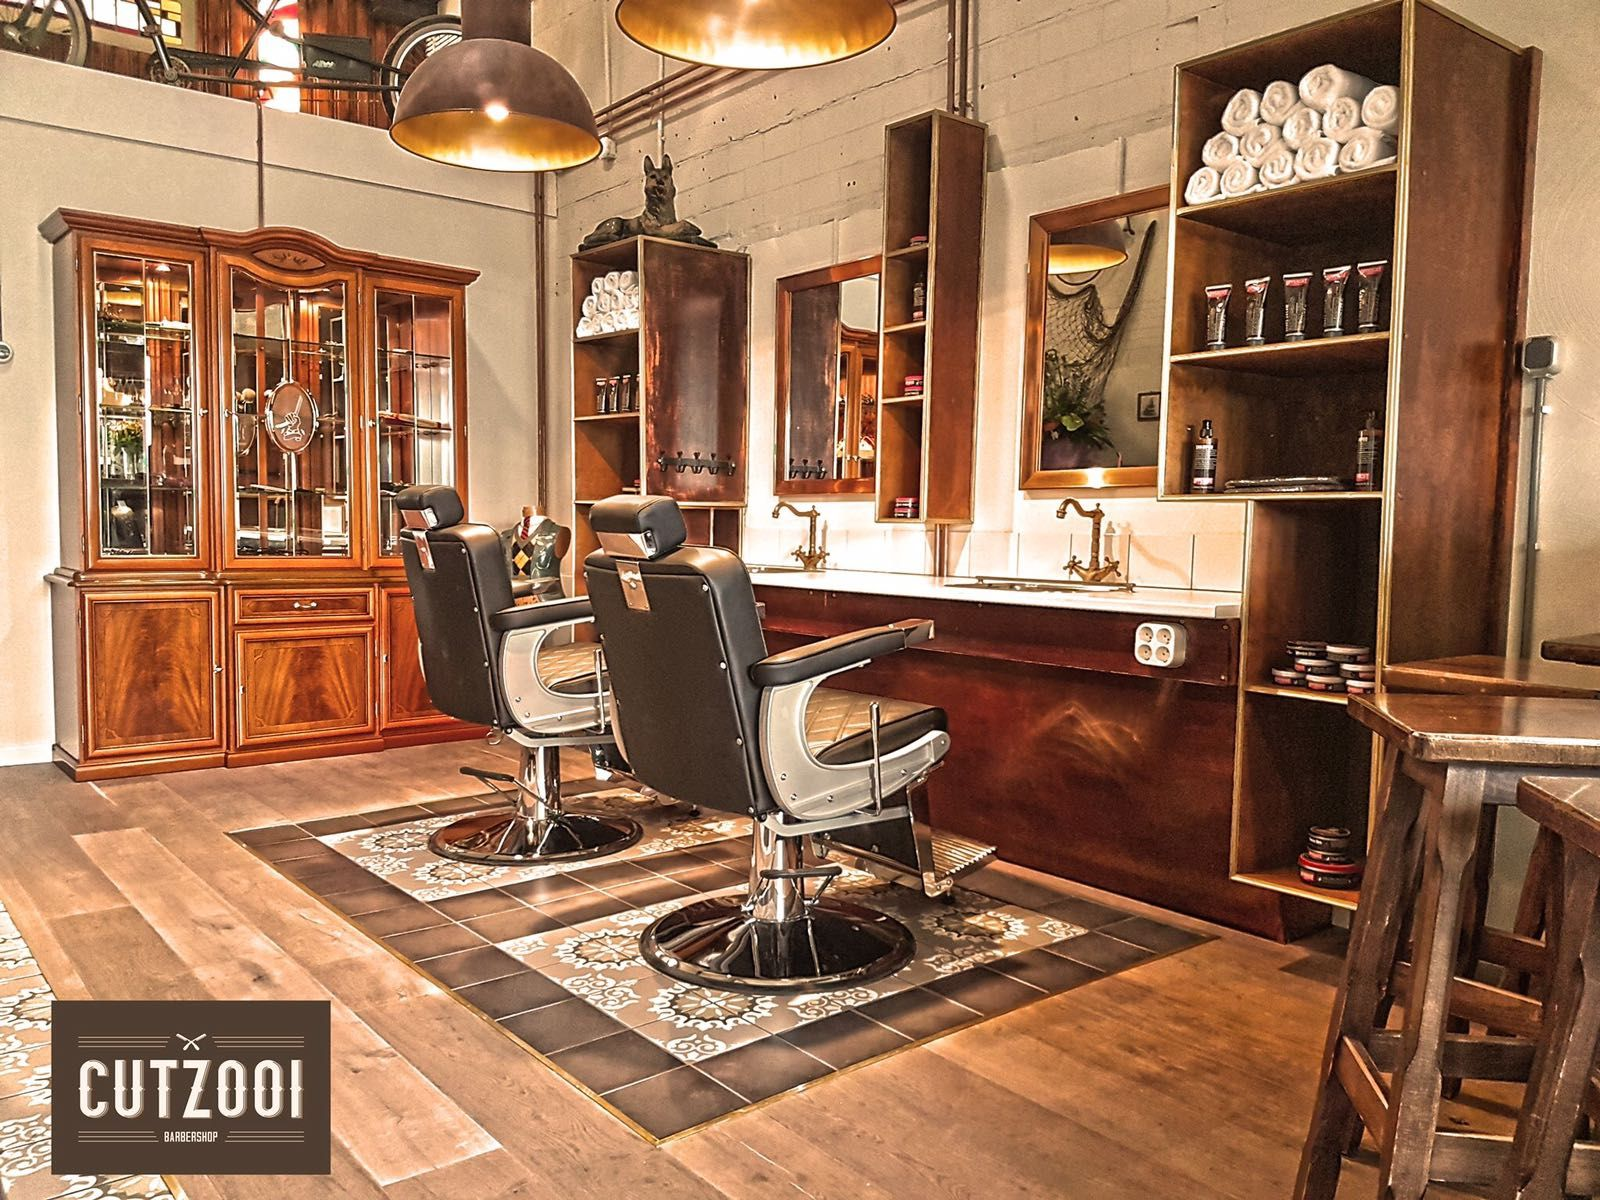 Cutzooi barbershop